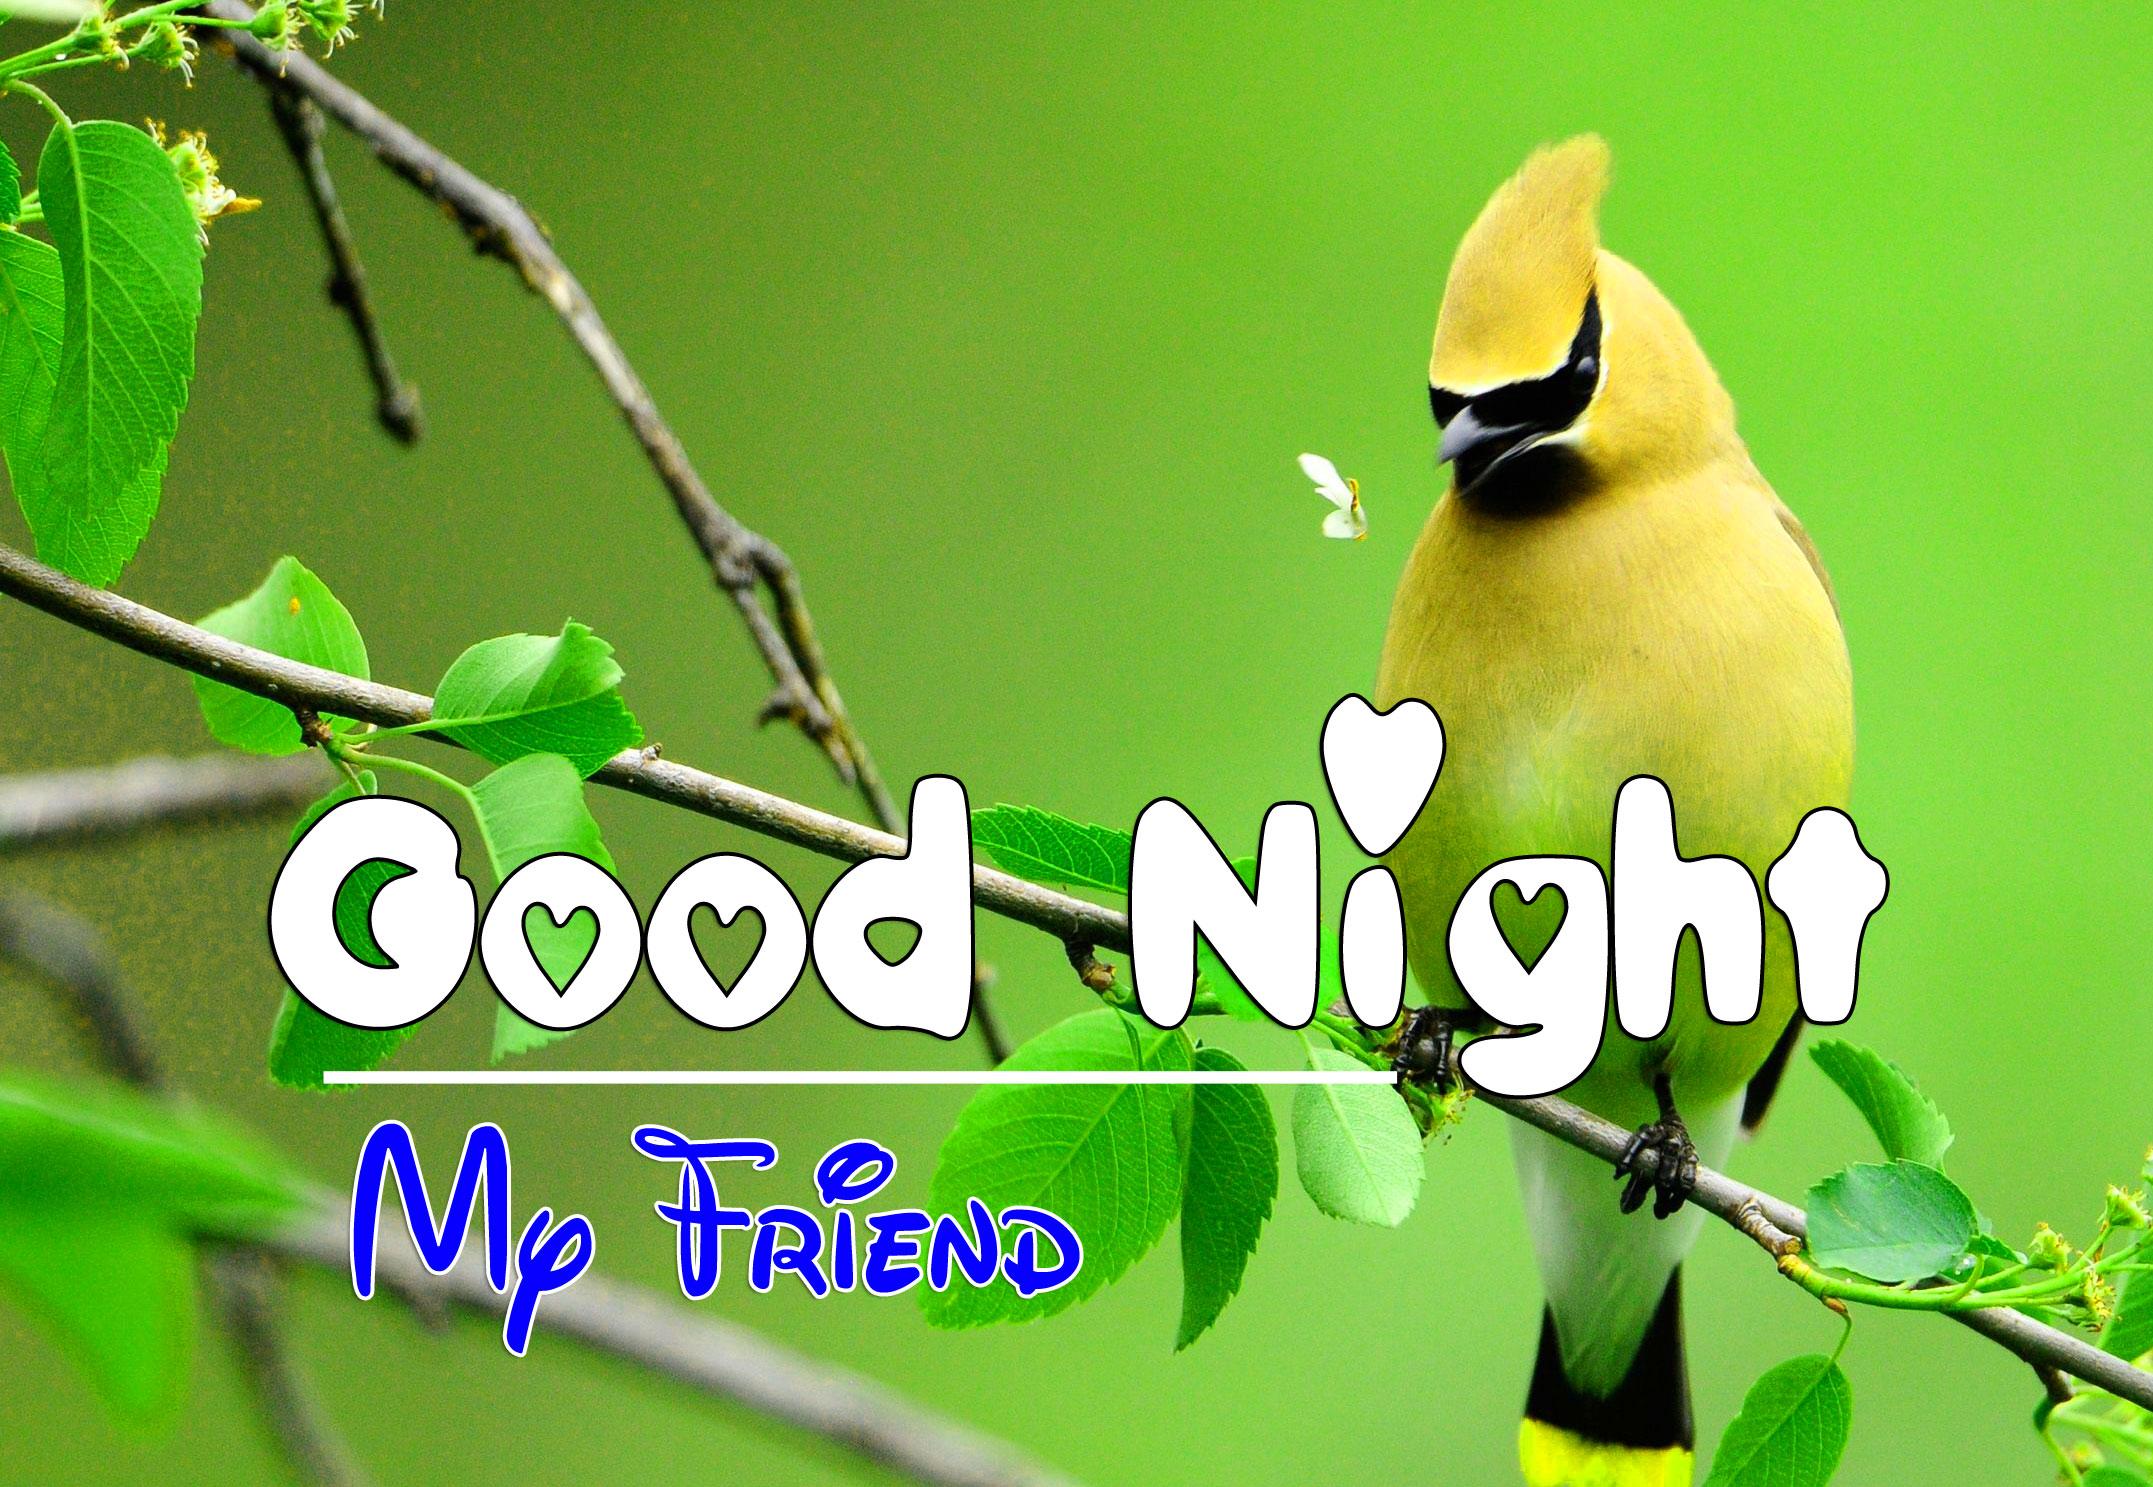 Bird Good Night Images